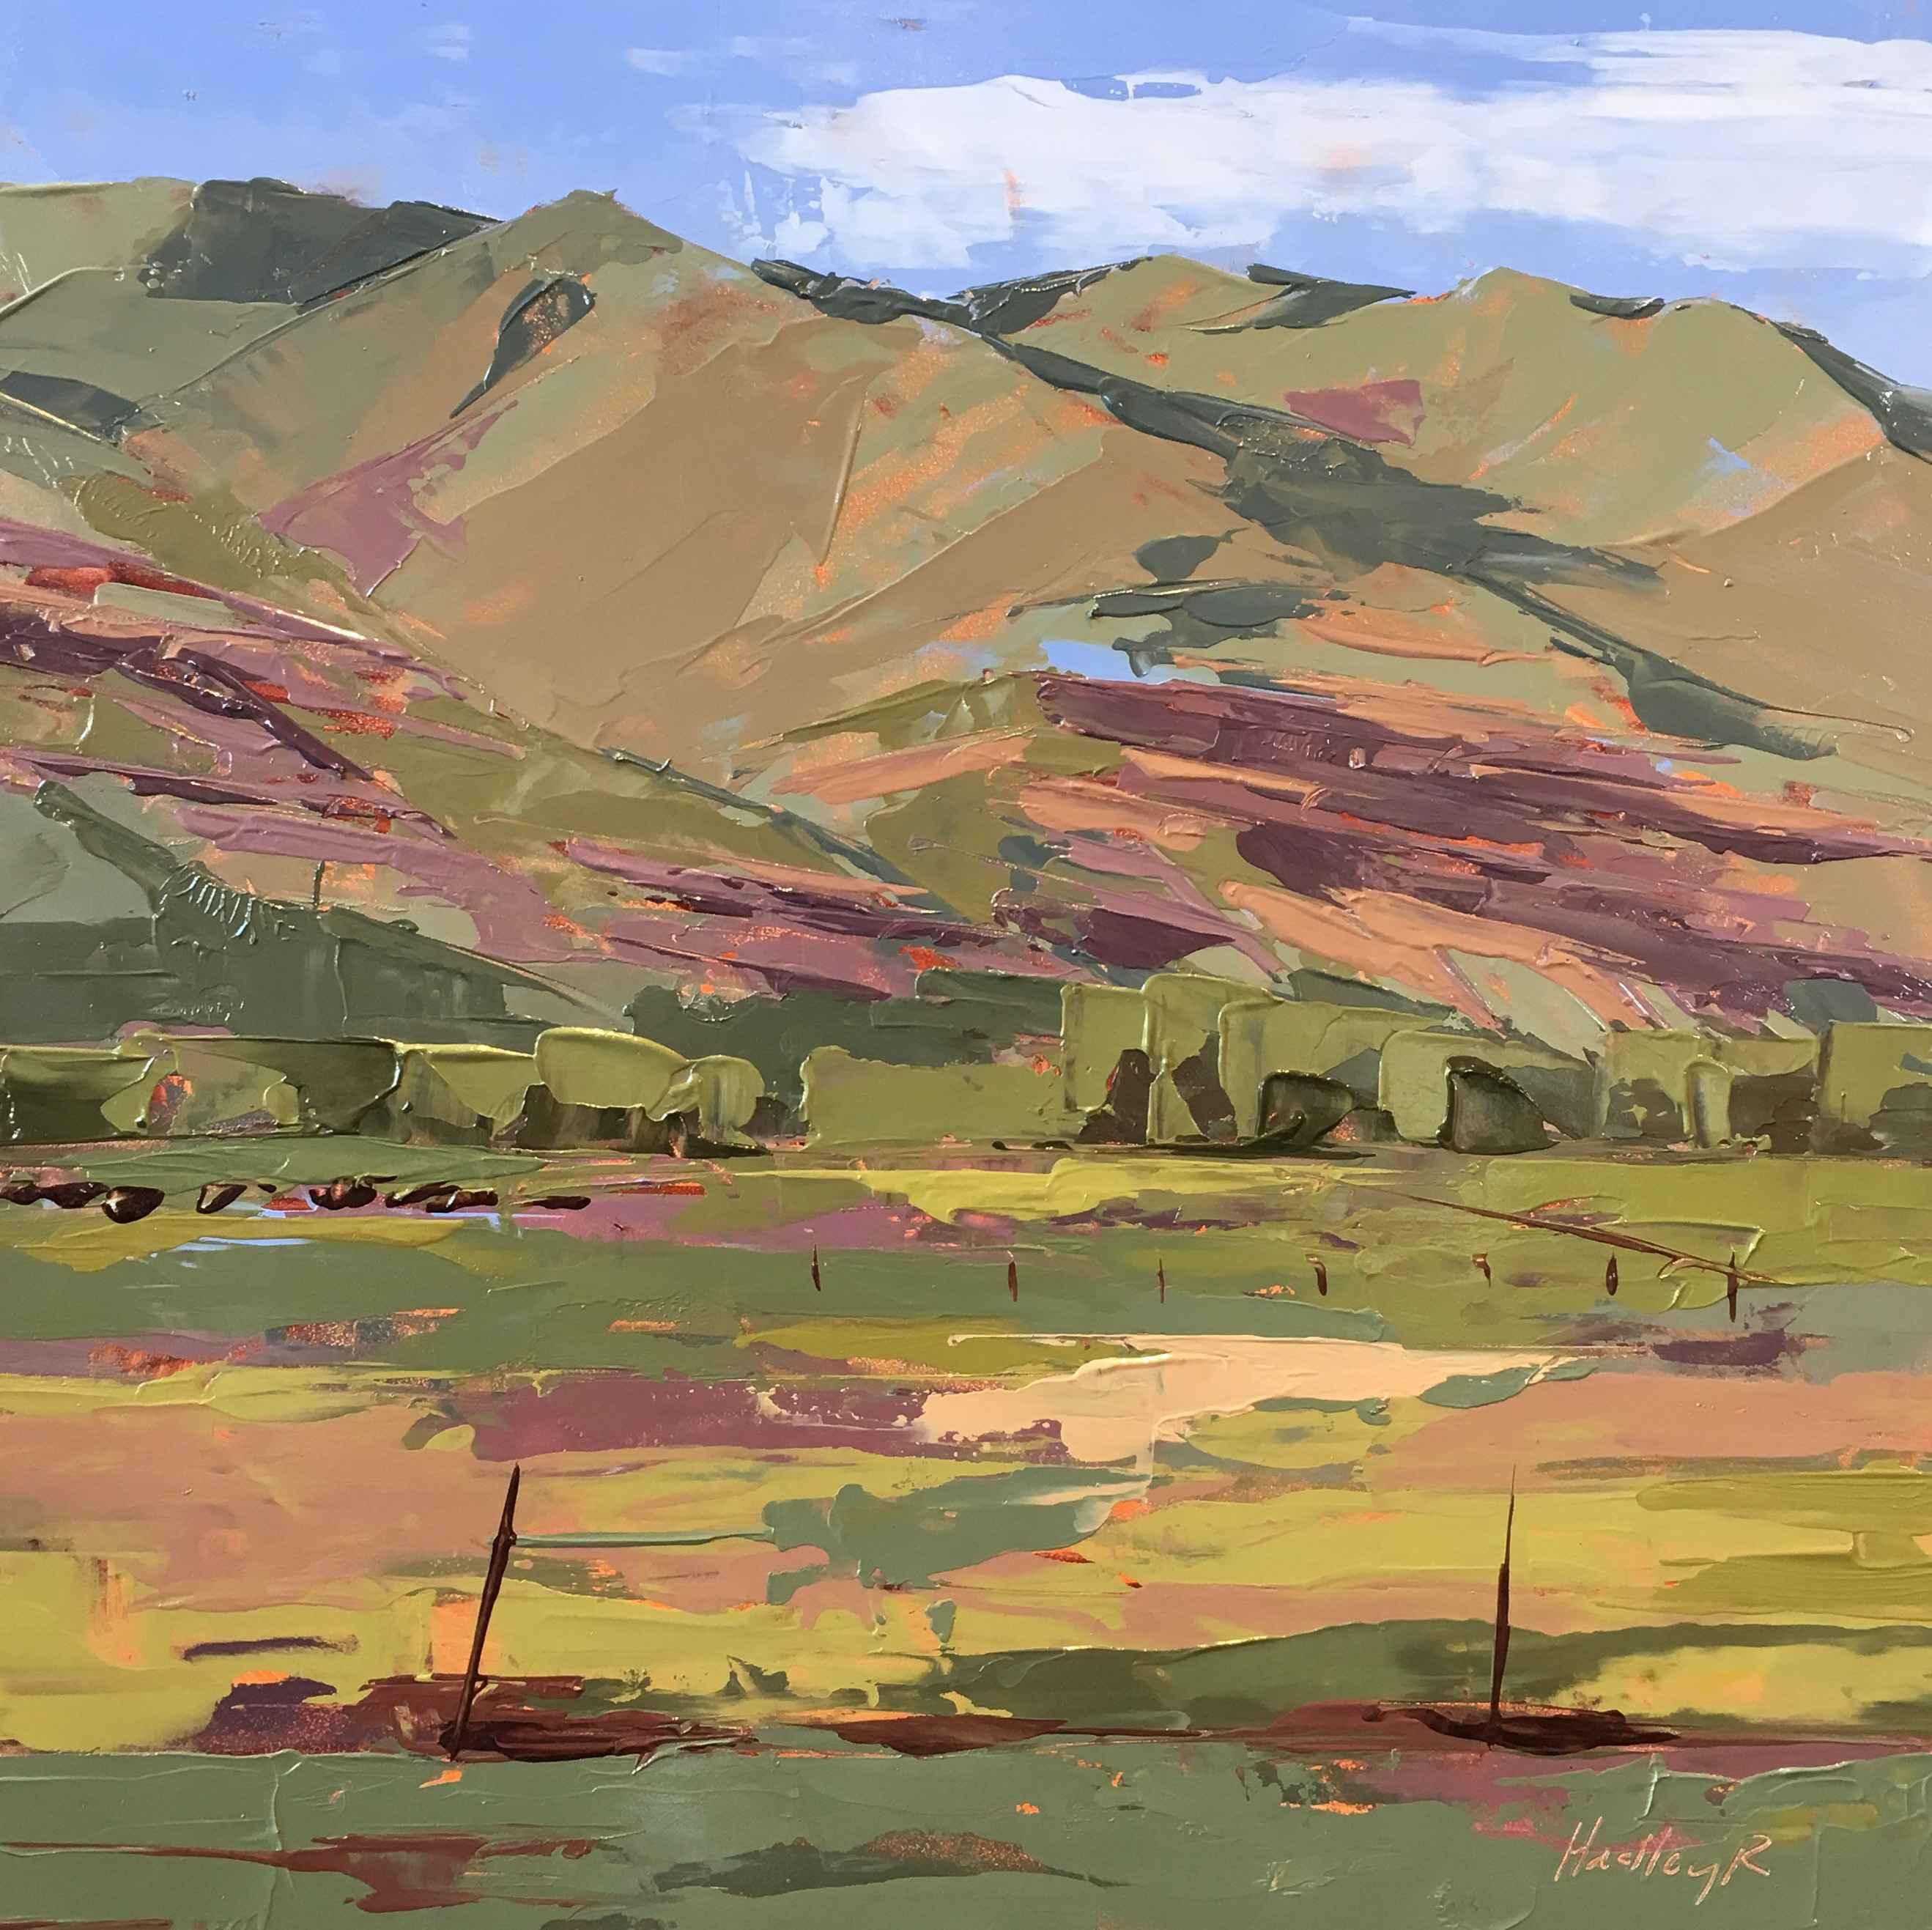 Hadley Rampton.  Artist Workshop. Sorrel Sky Gallery. Durango Art Gallery. Santa Fe Art Gallery.